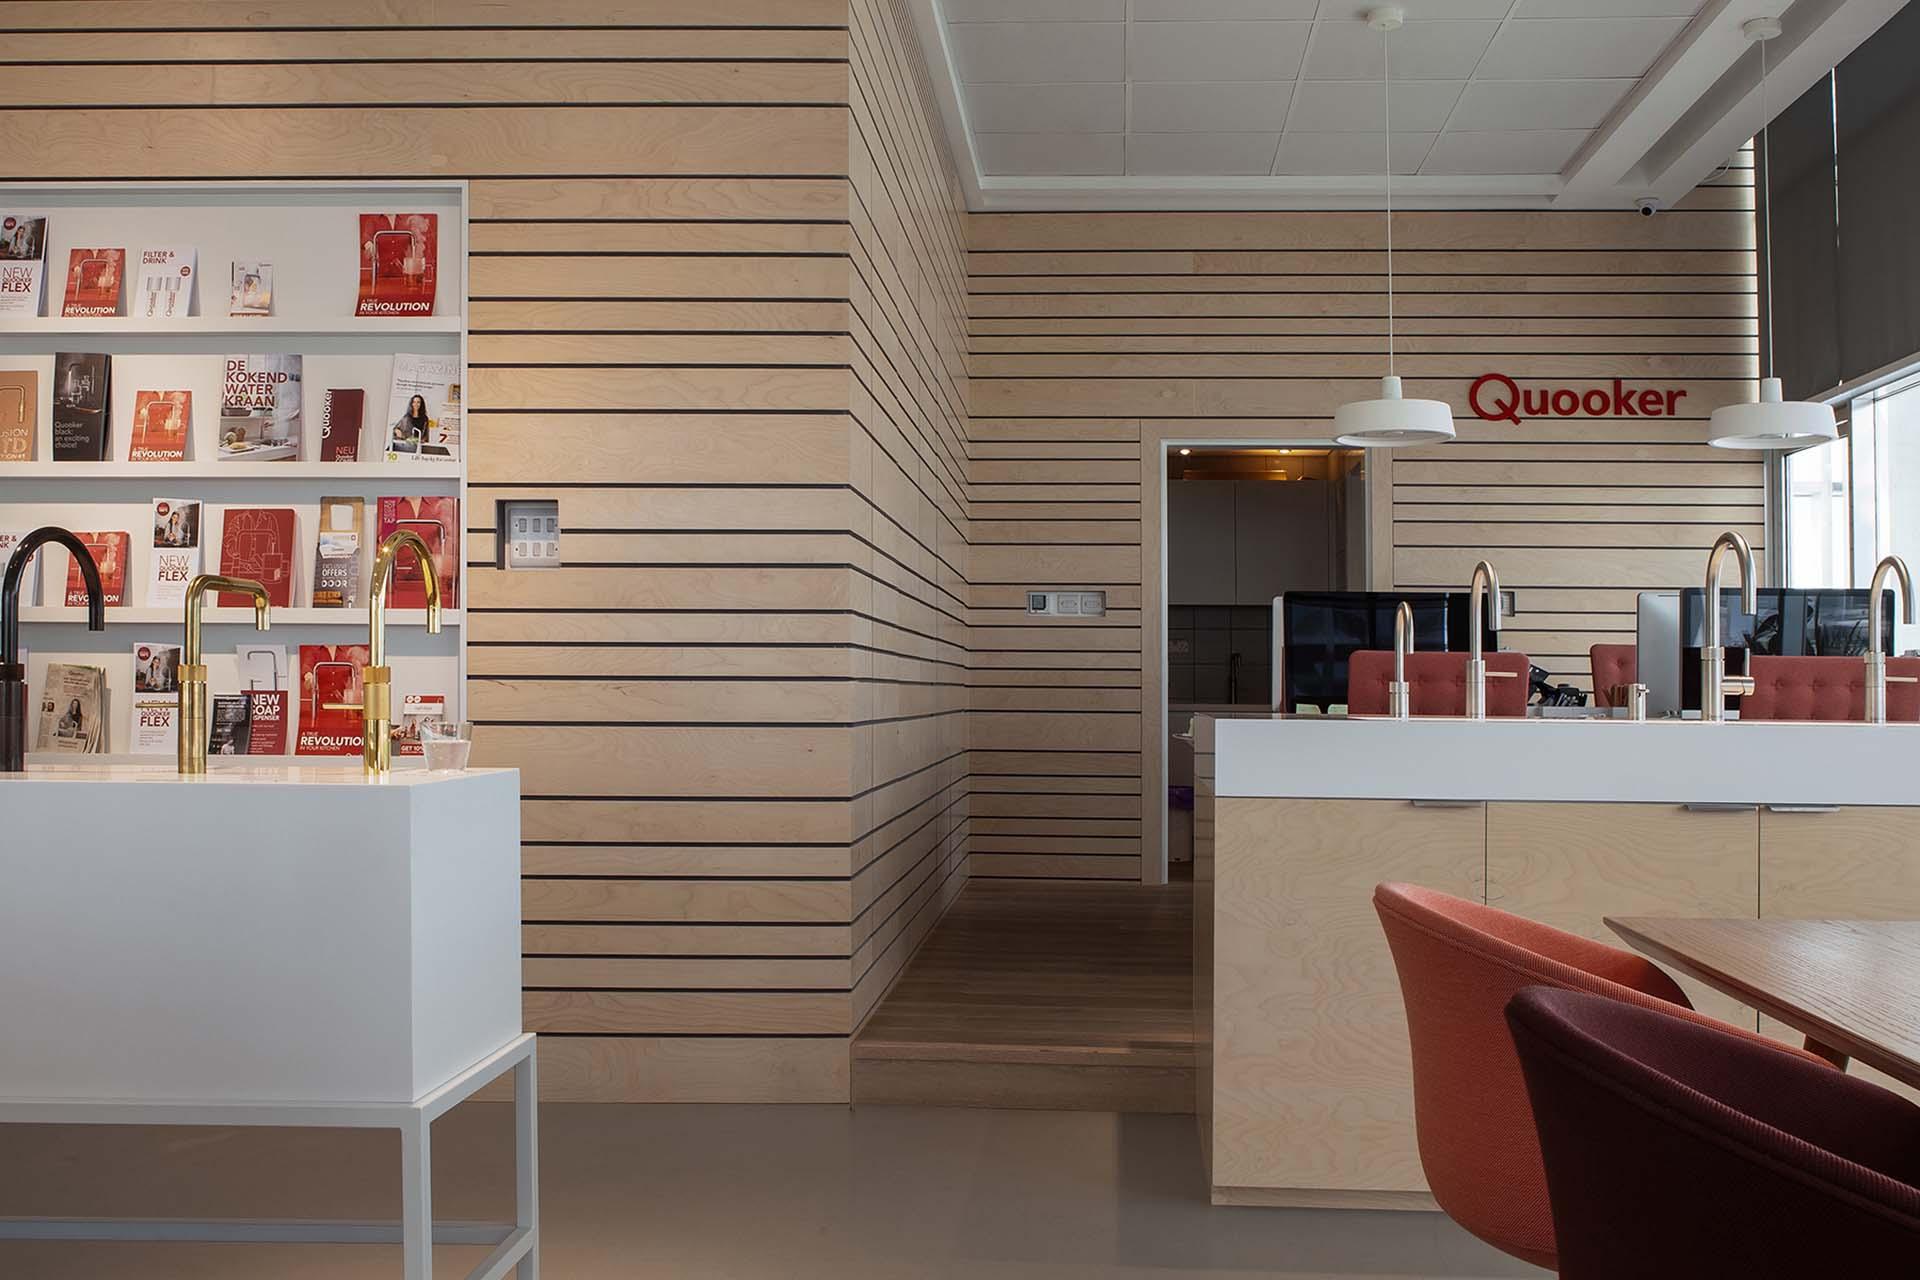 Wooden wall Quooker shaoroom Dubai.